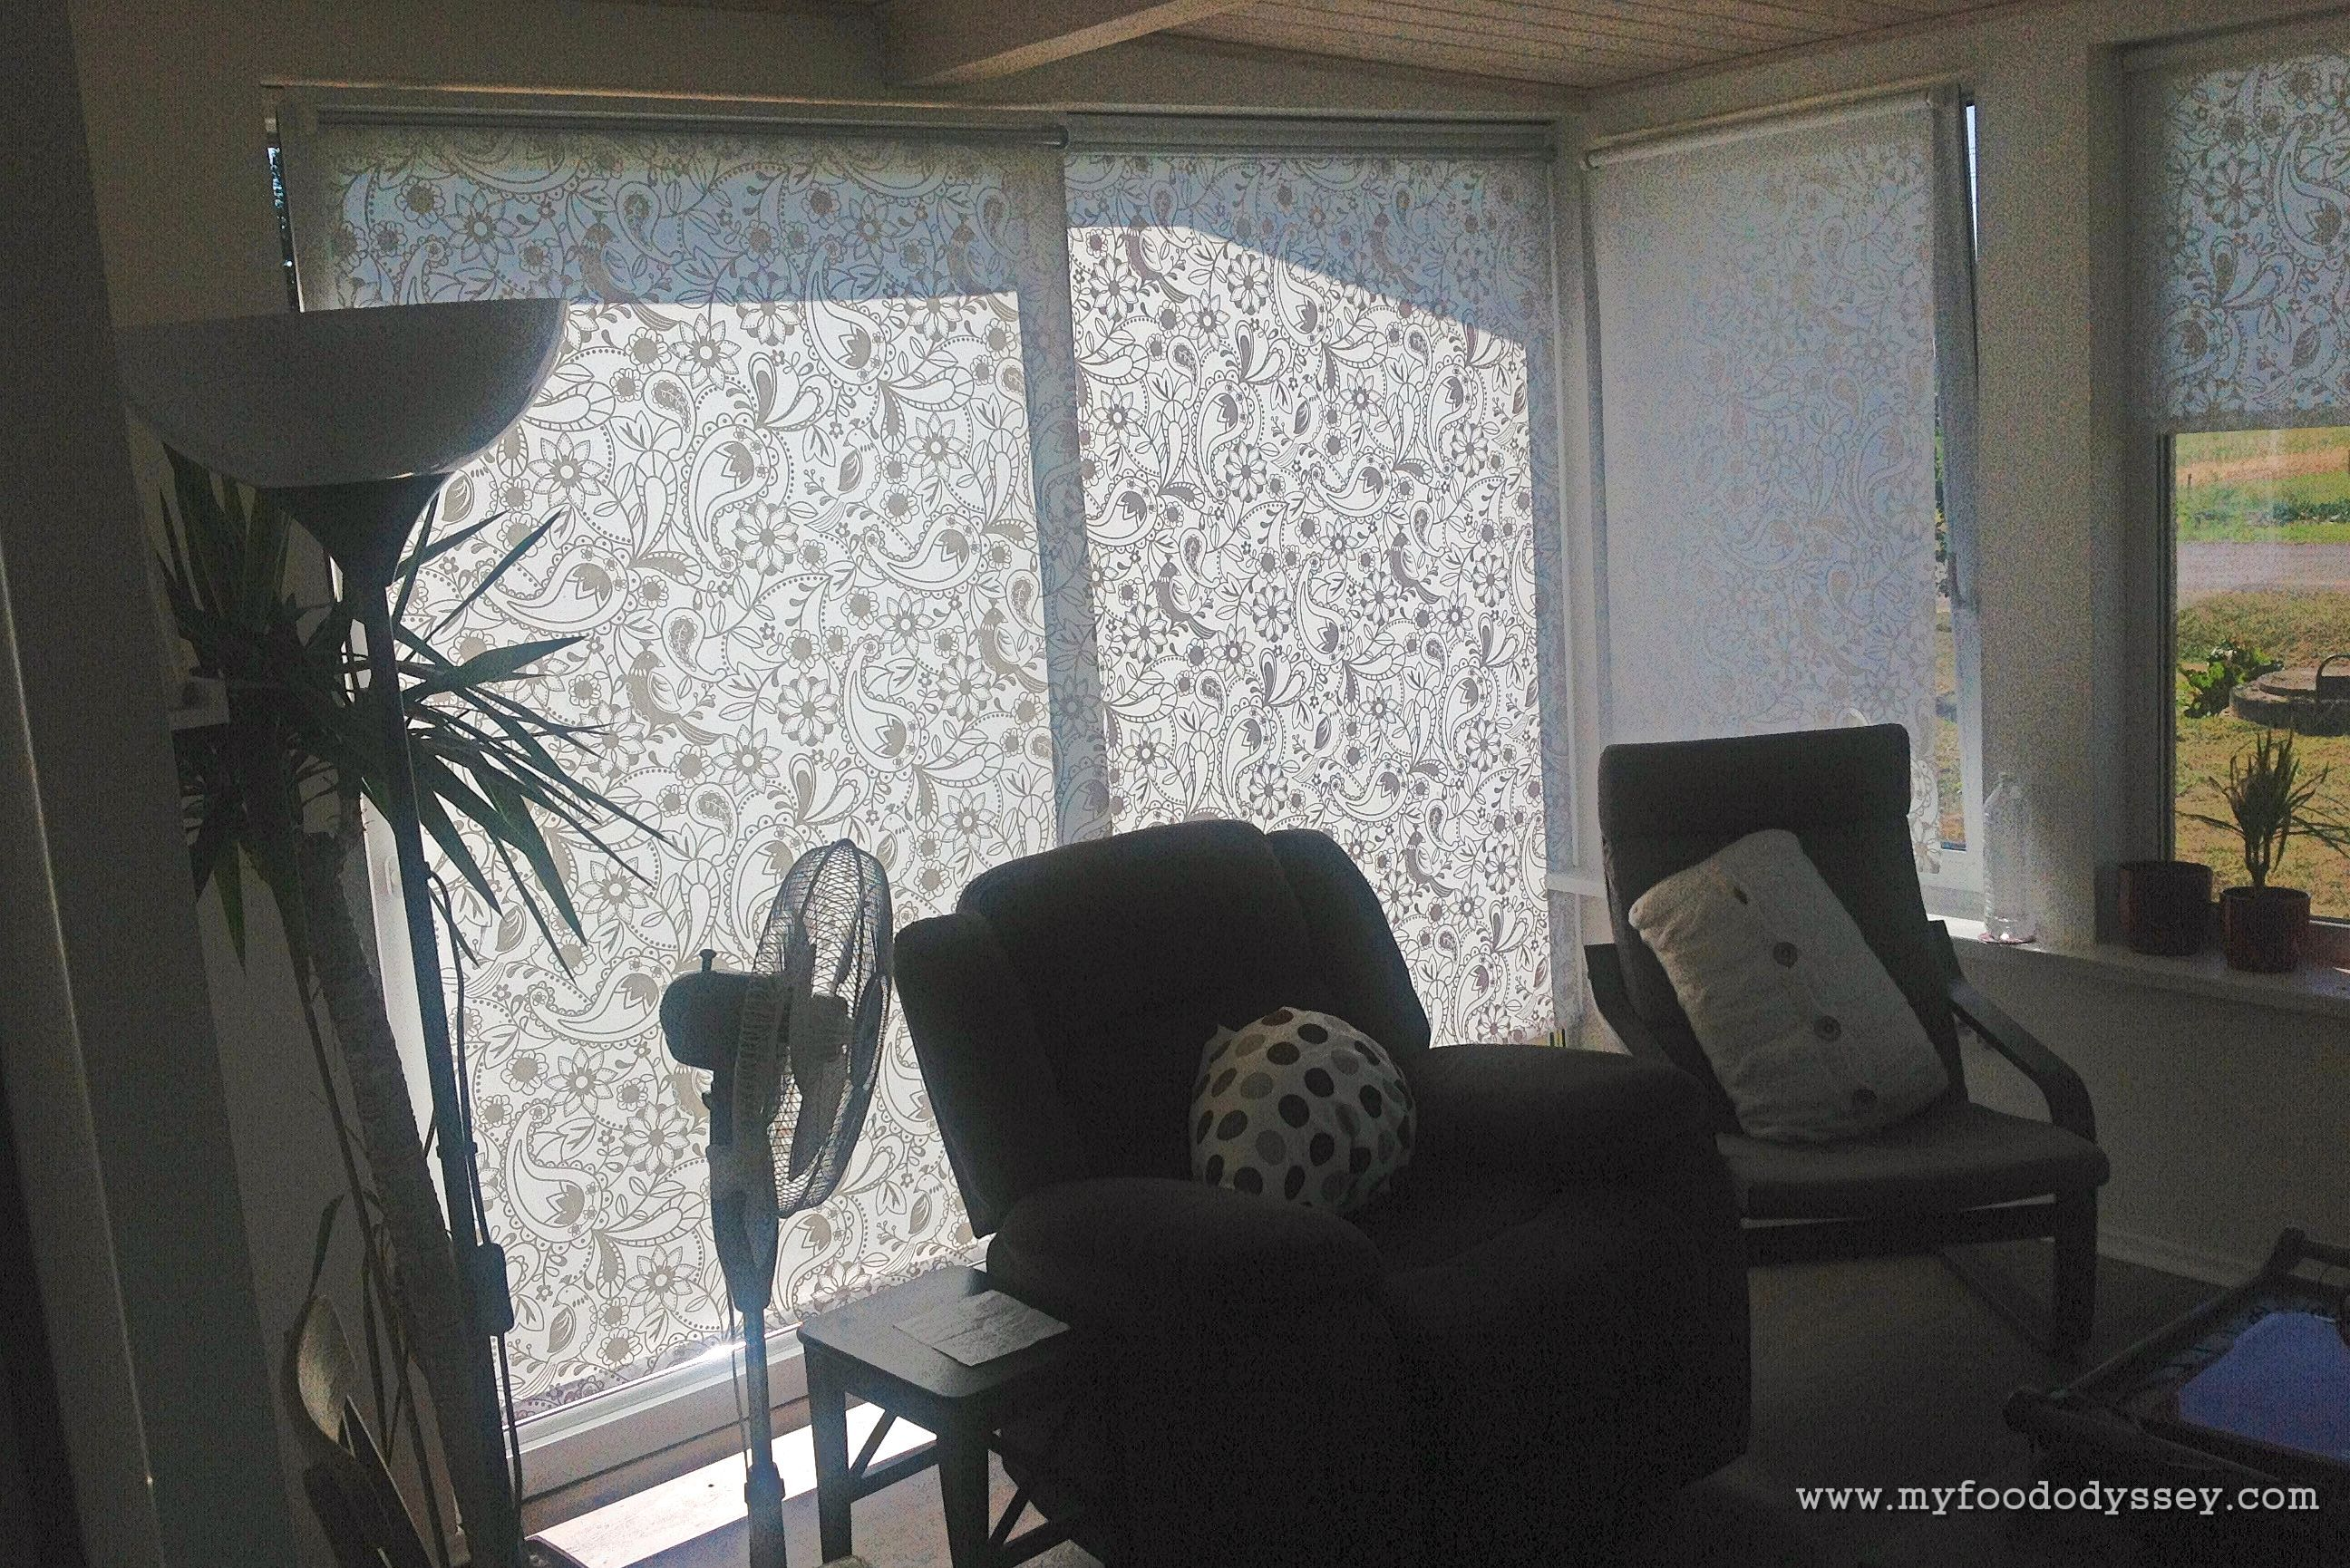 Best Useful Tips Ikea Blinds Schottis Patio Blinds Porches Vertical Blinds Office Roller Blinds Office Vertica Living Room Blinds Outdoor Blinds Fabric Blinds